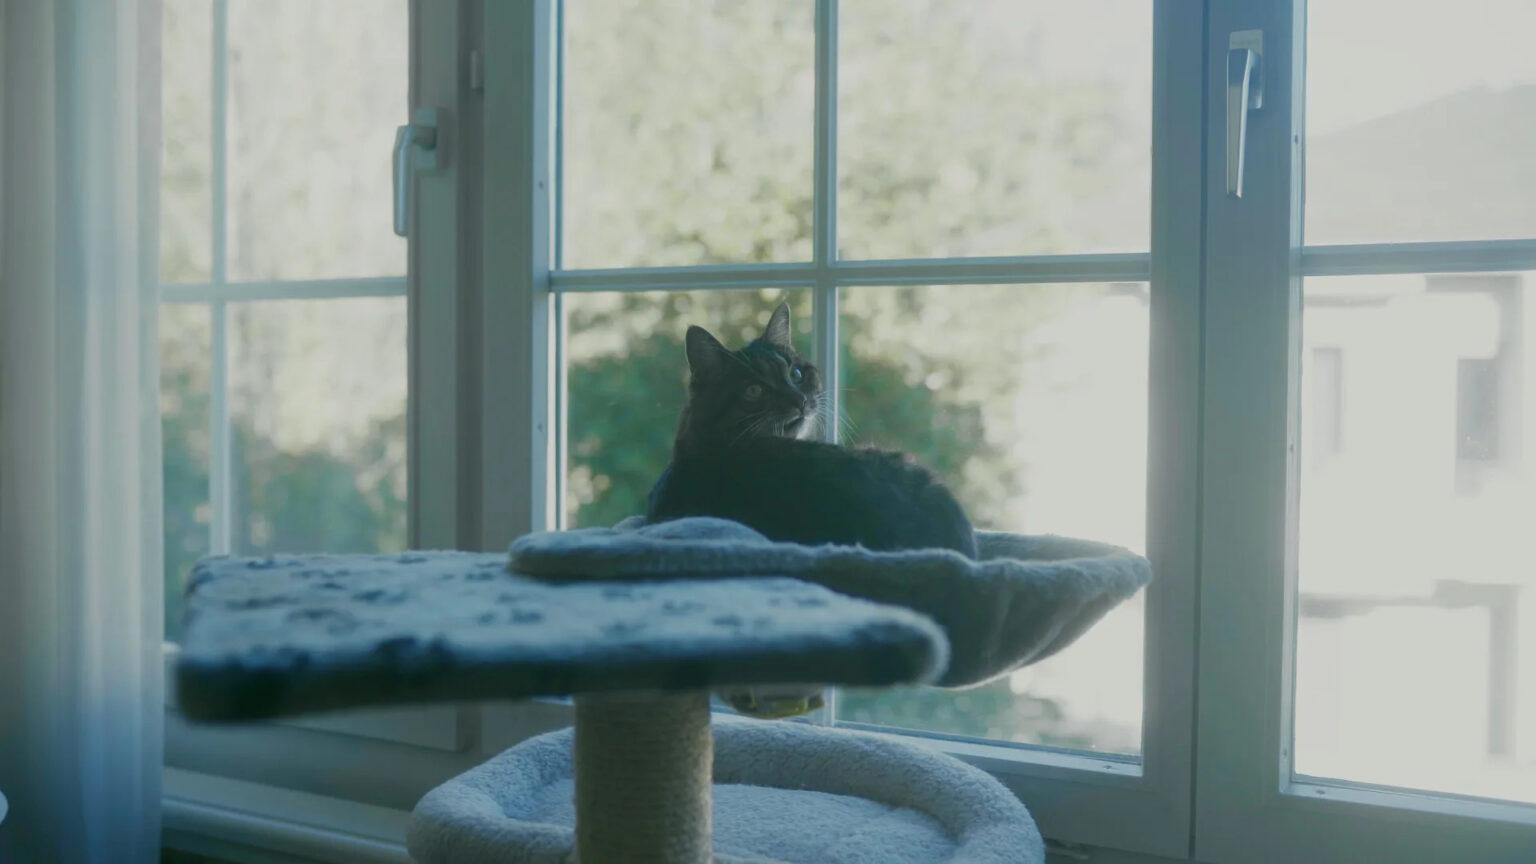 Katze beobachtet spezialisierte Spitex Palliativcare